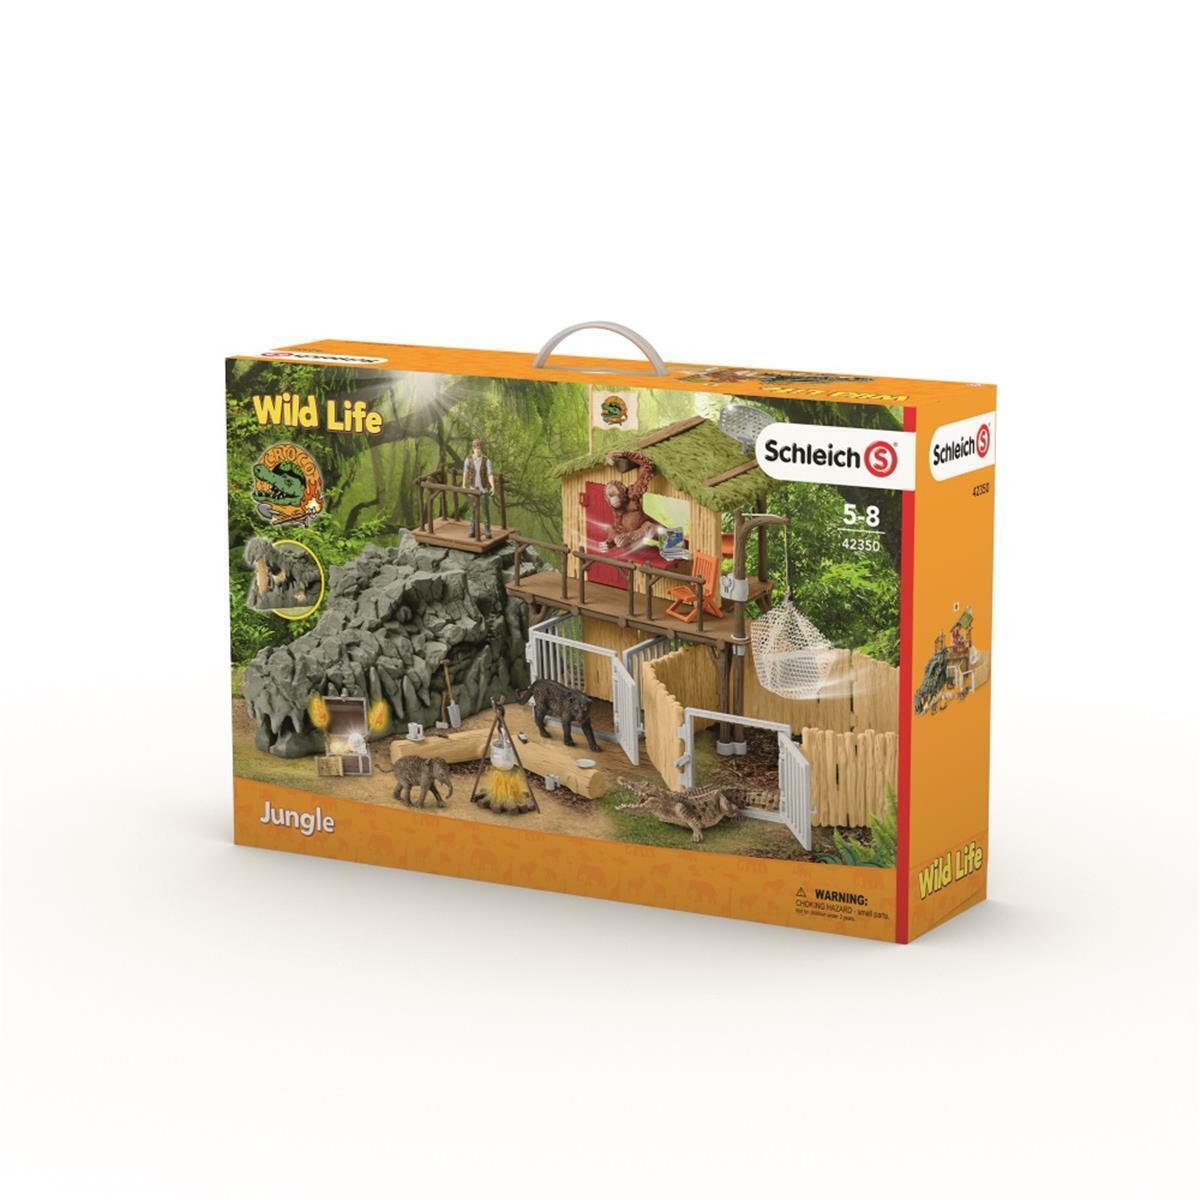 Schleich Wild Life basurillas jungla investigación estación Croco   juguetes a partir de 5 J